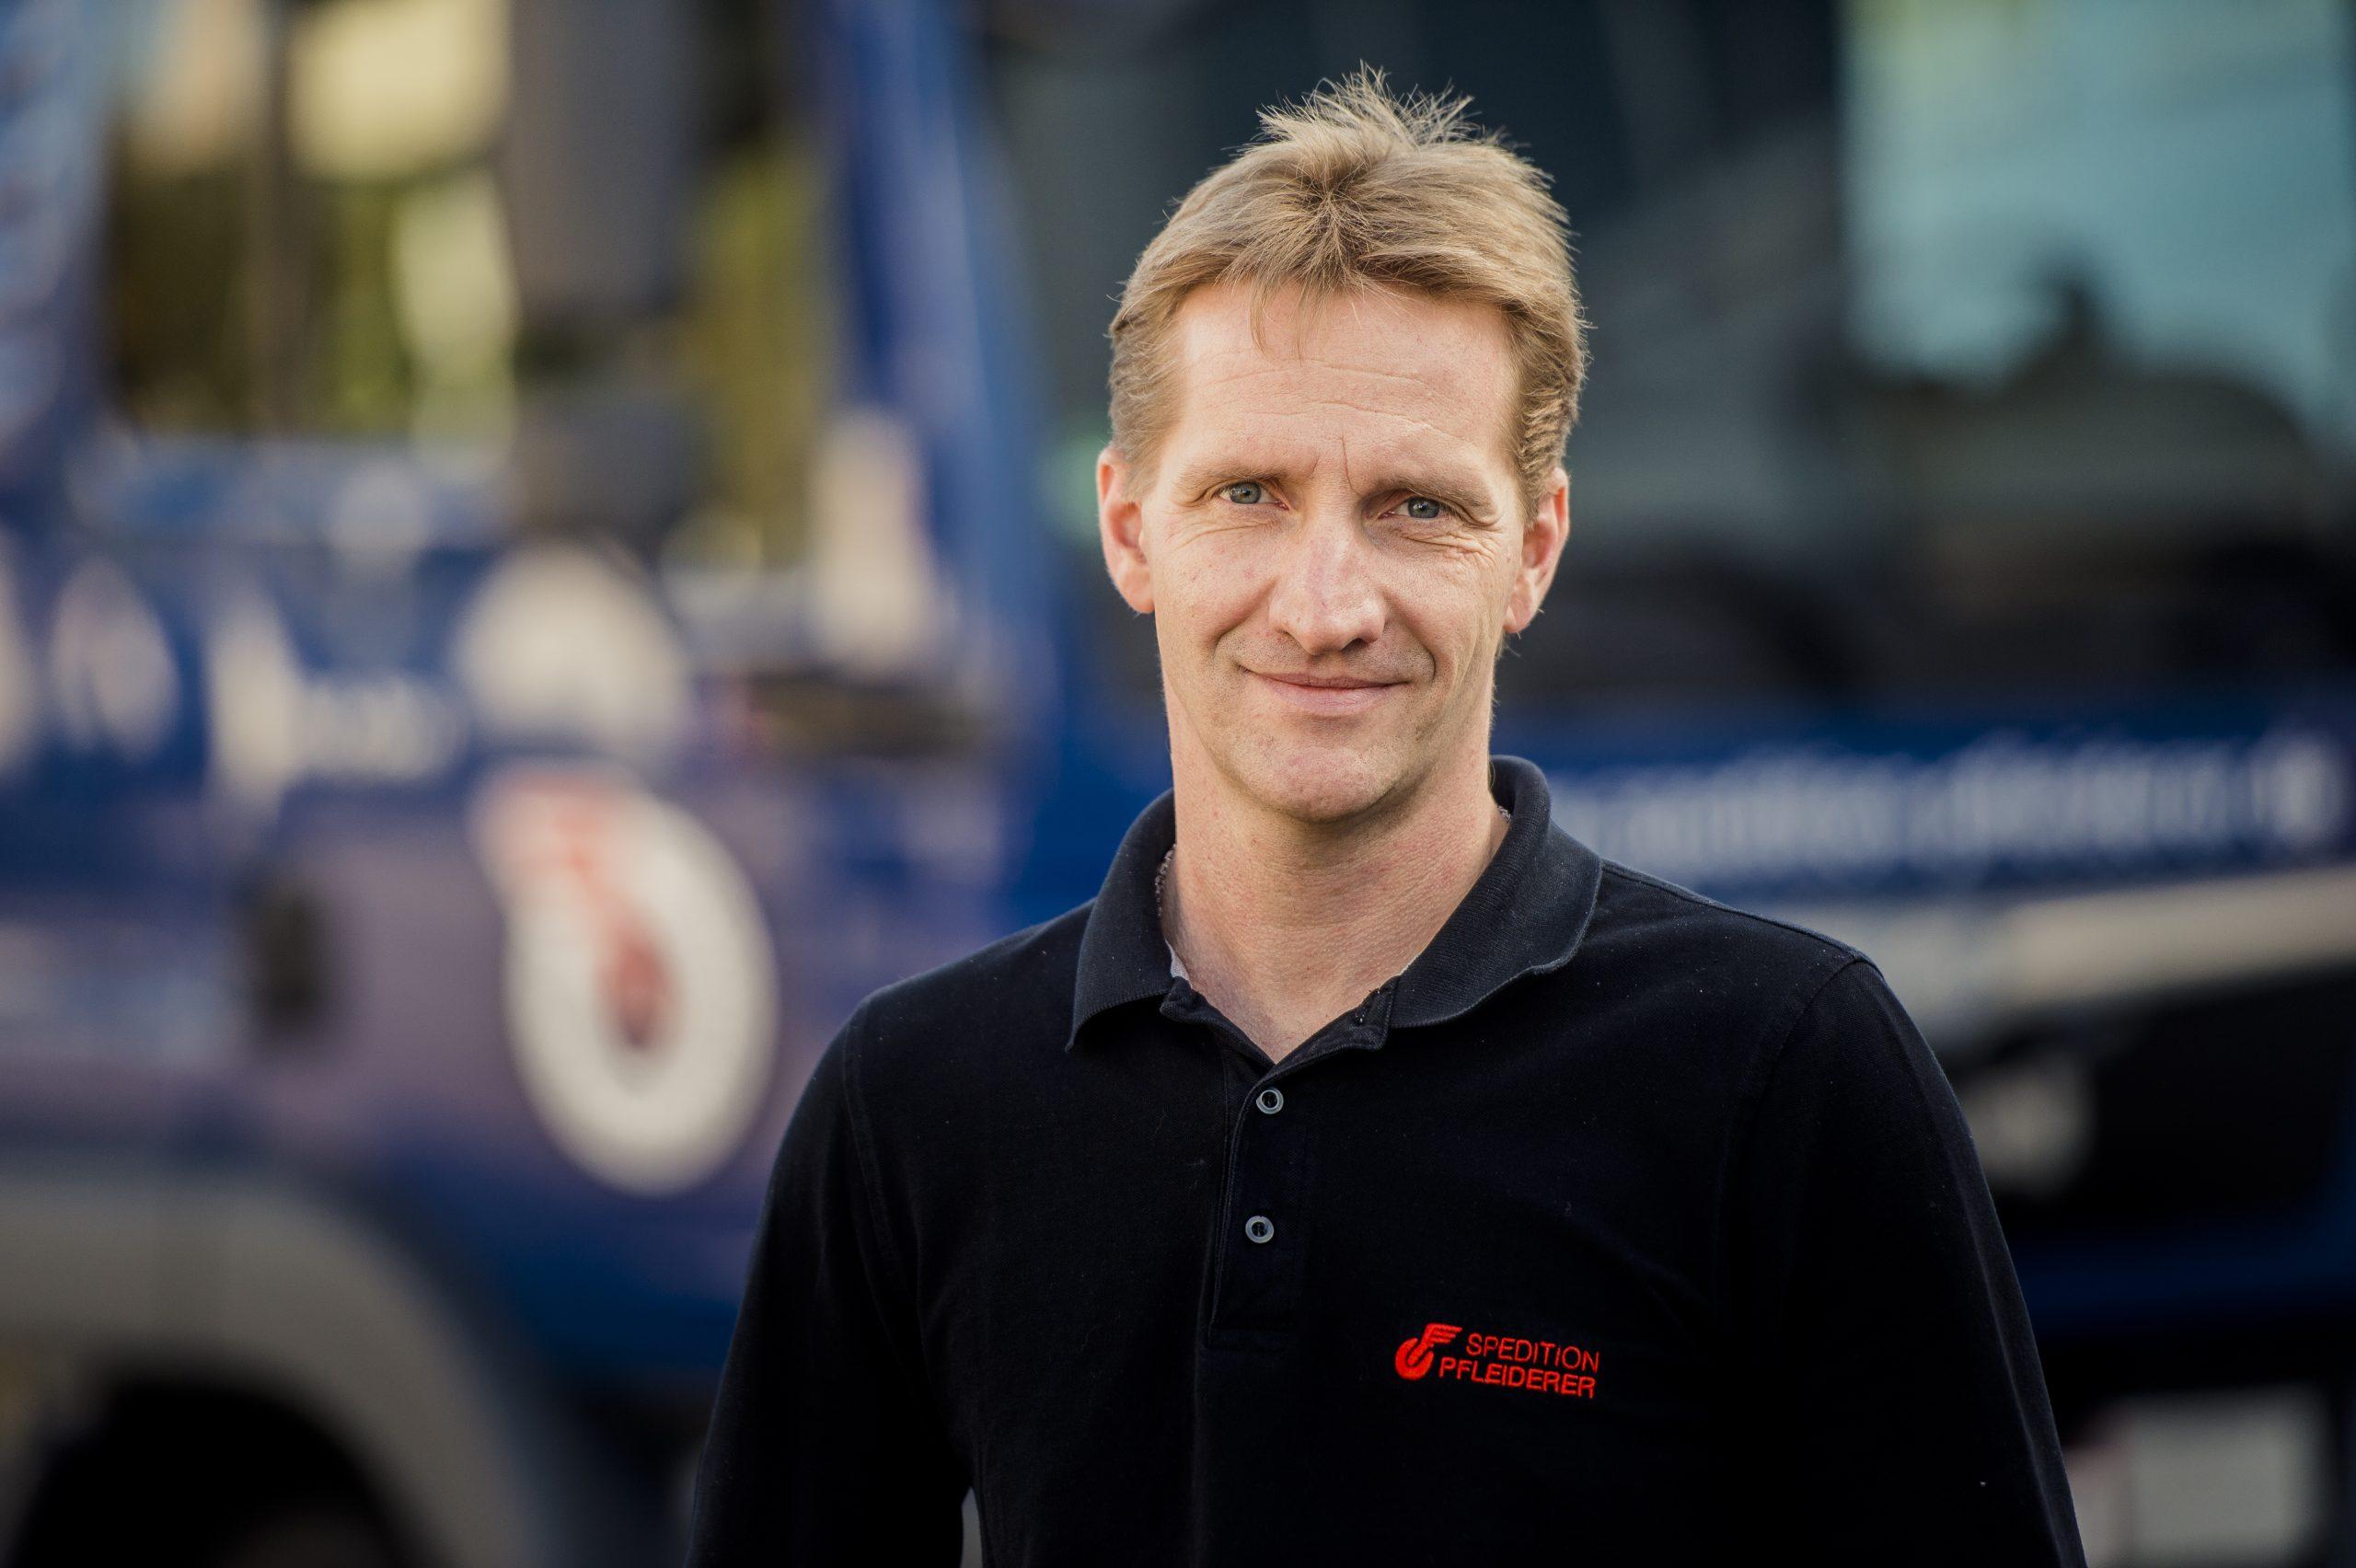 Thorsten Haas